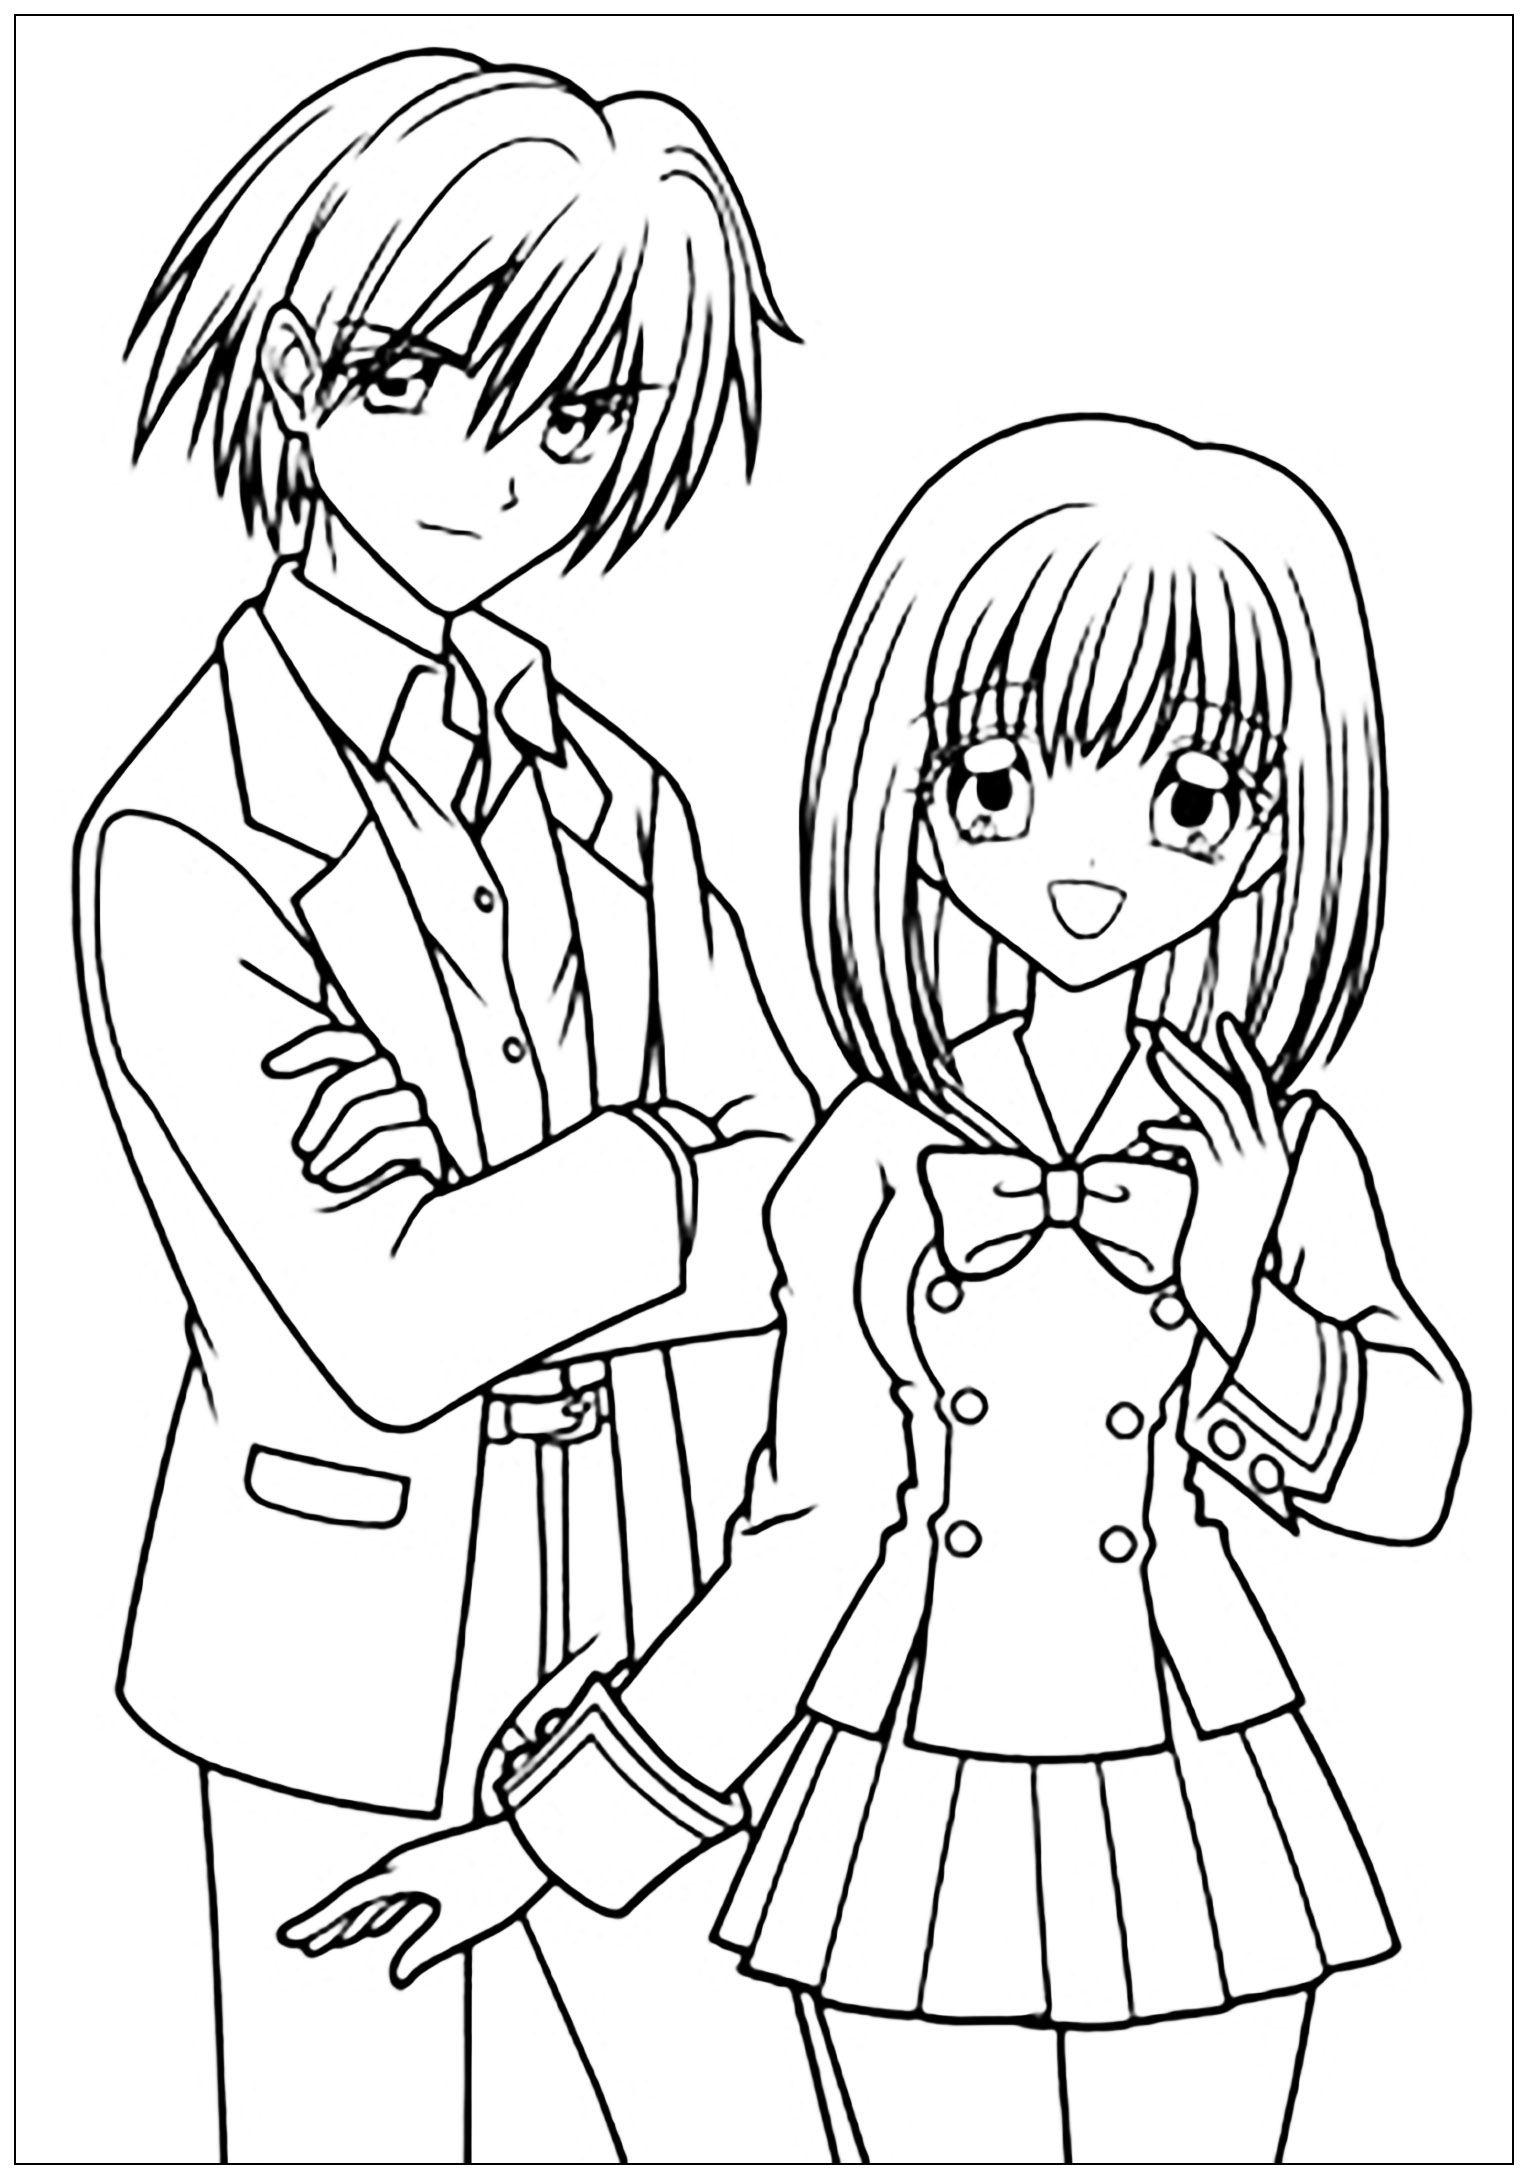 Manga drawing boy and girl in school suit Manga Anime